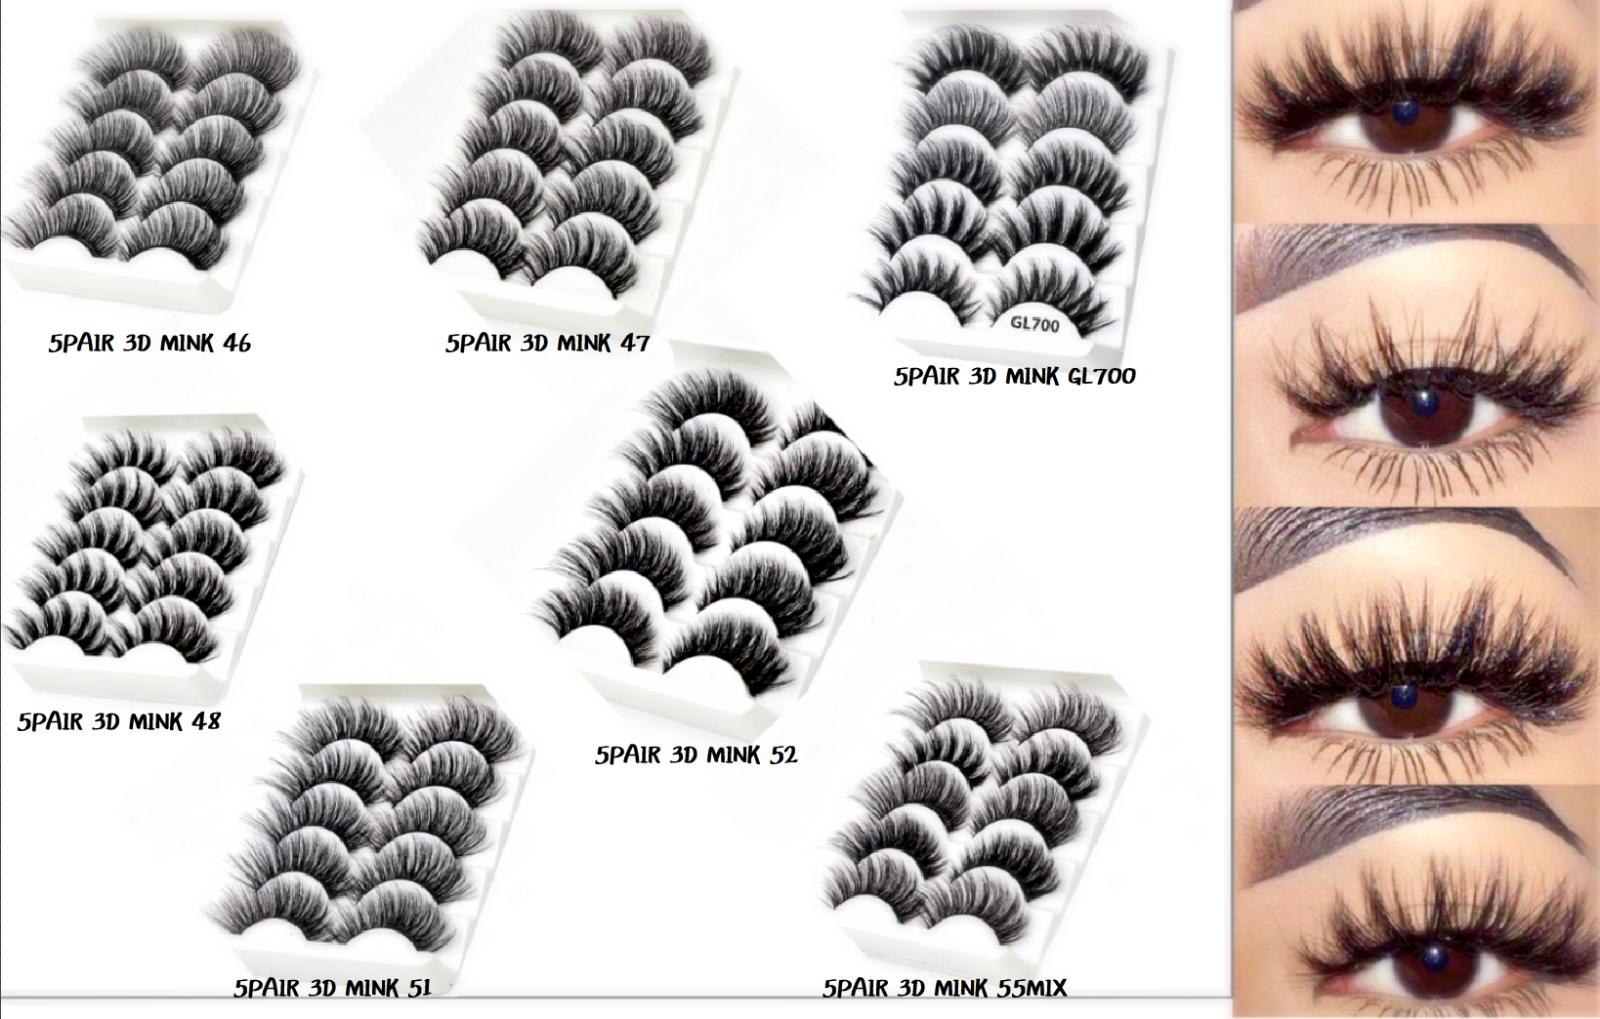 UK 5 Pairs 3D Fake Eyelashes Long Thick Natural False Eye Lashes Set Mink Makeup 2